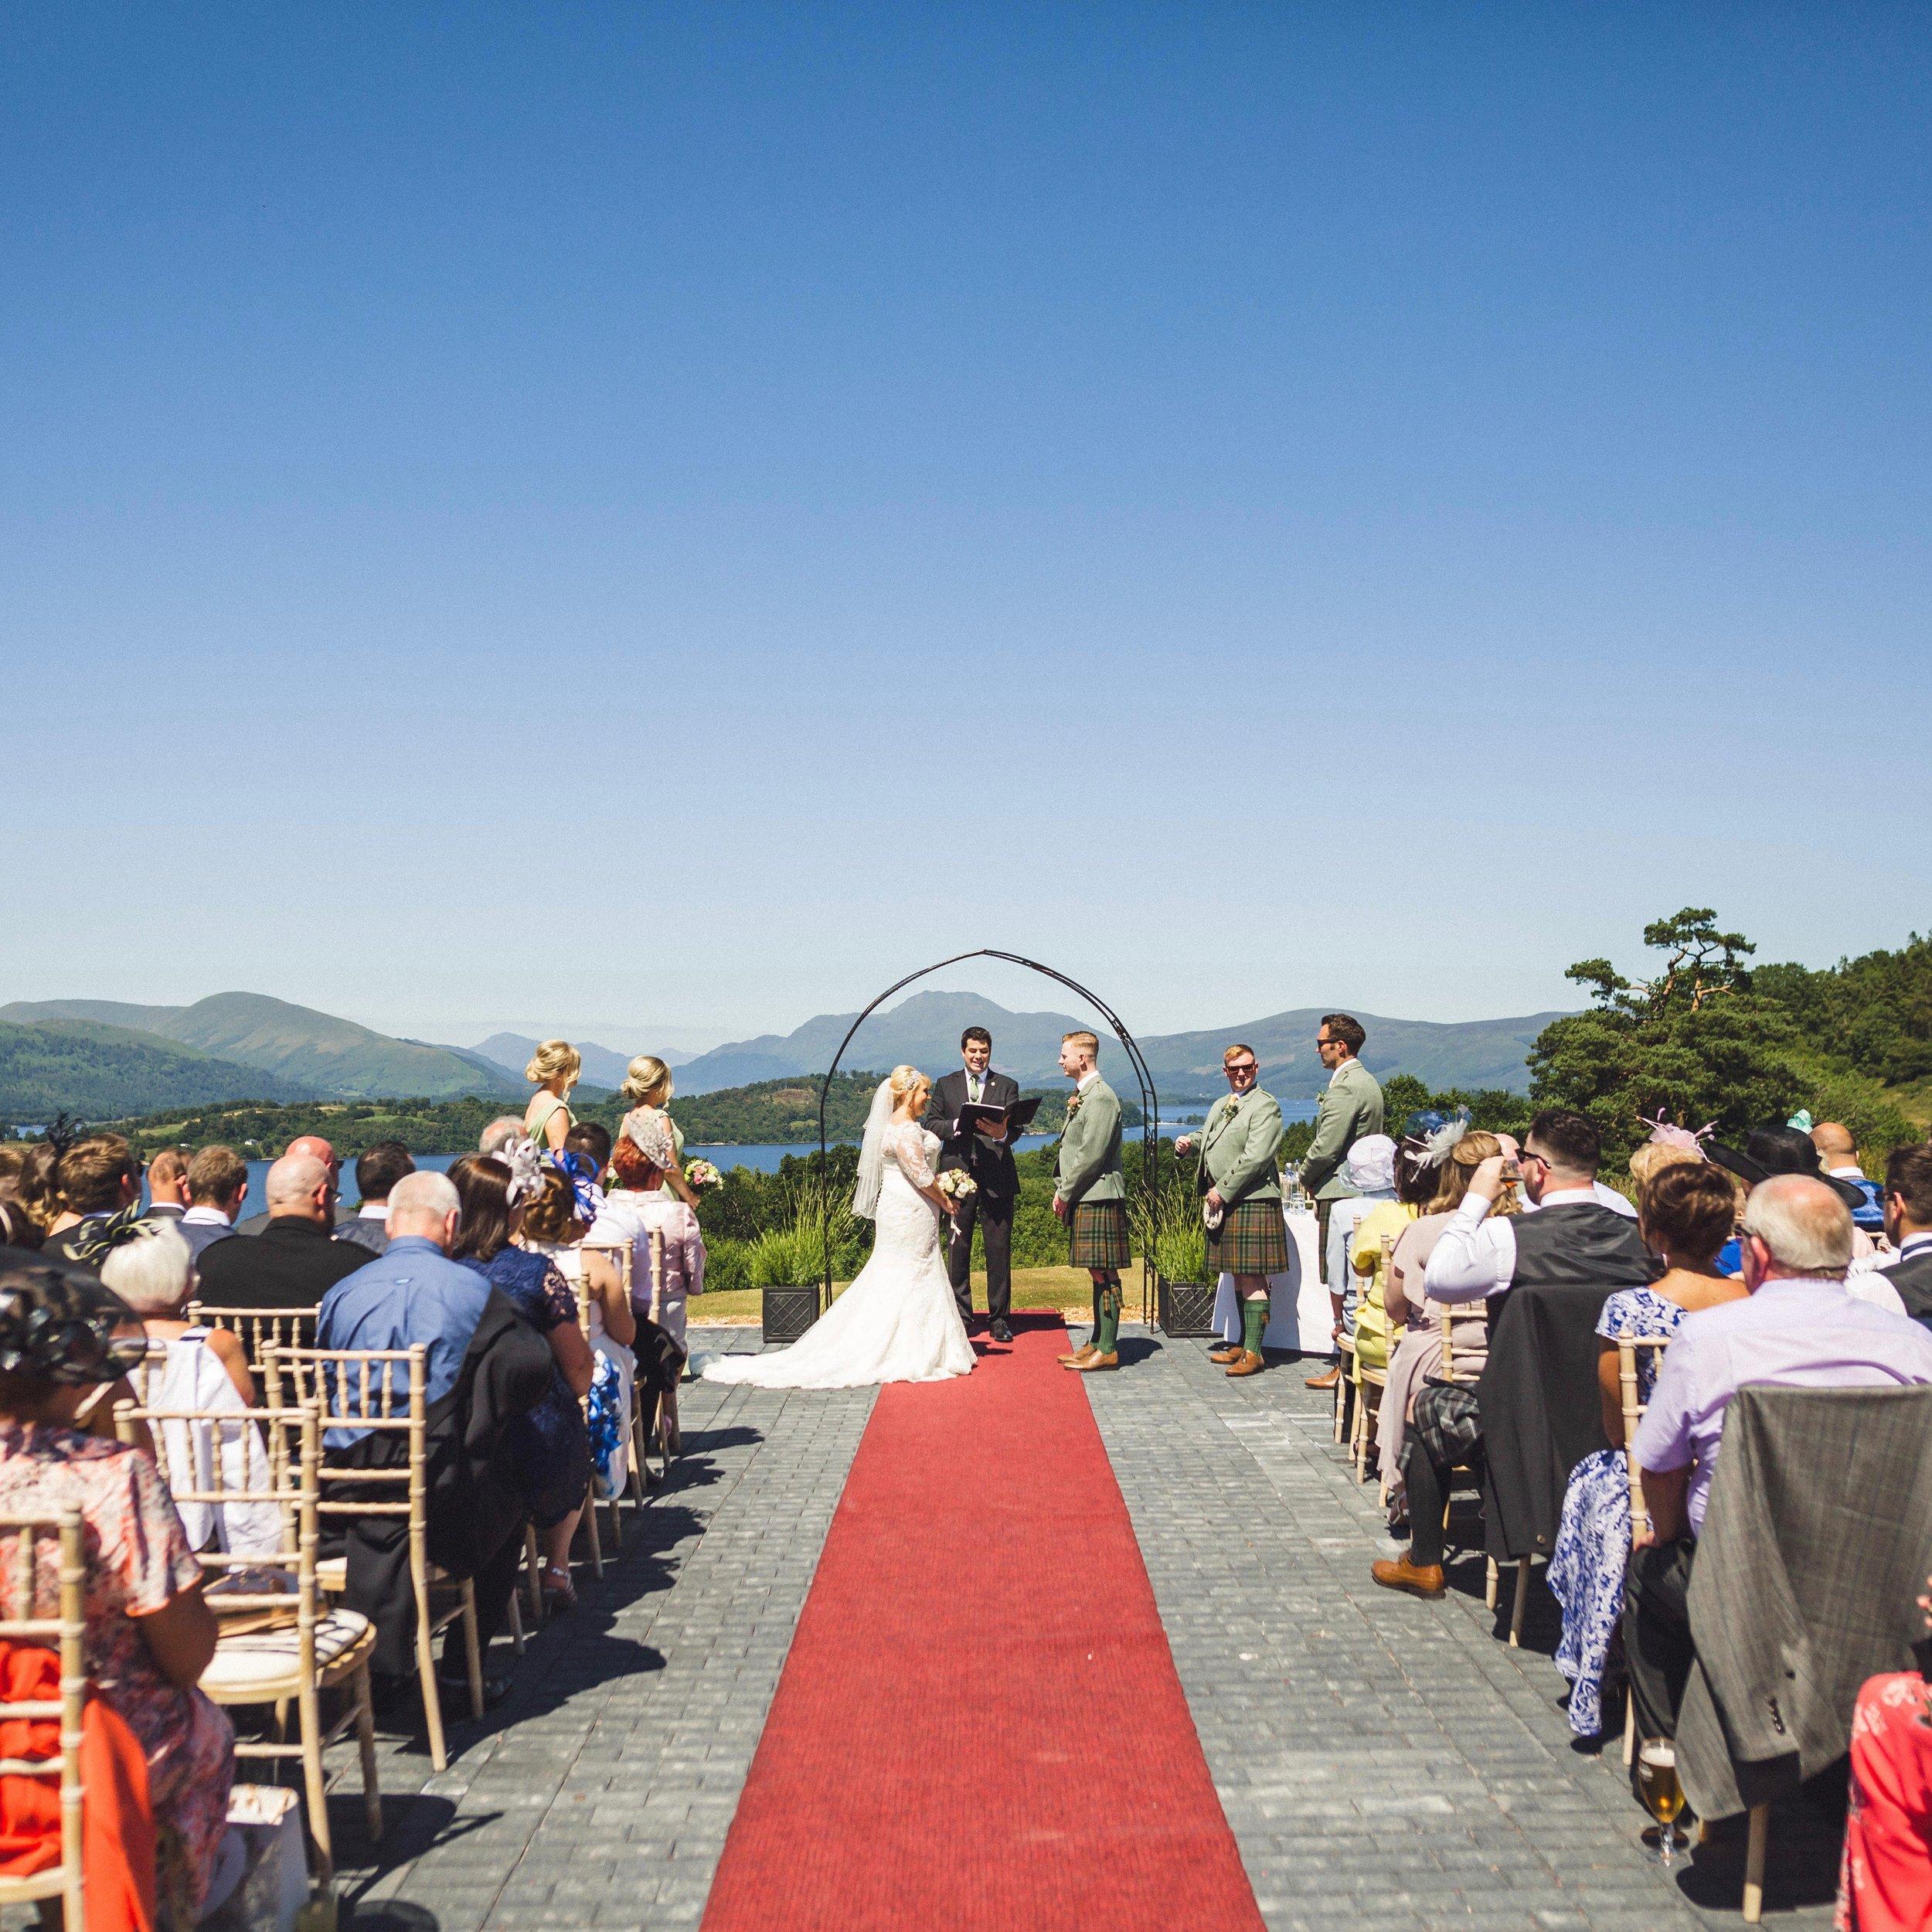 boturich castle scottish wedding venues.jpg